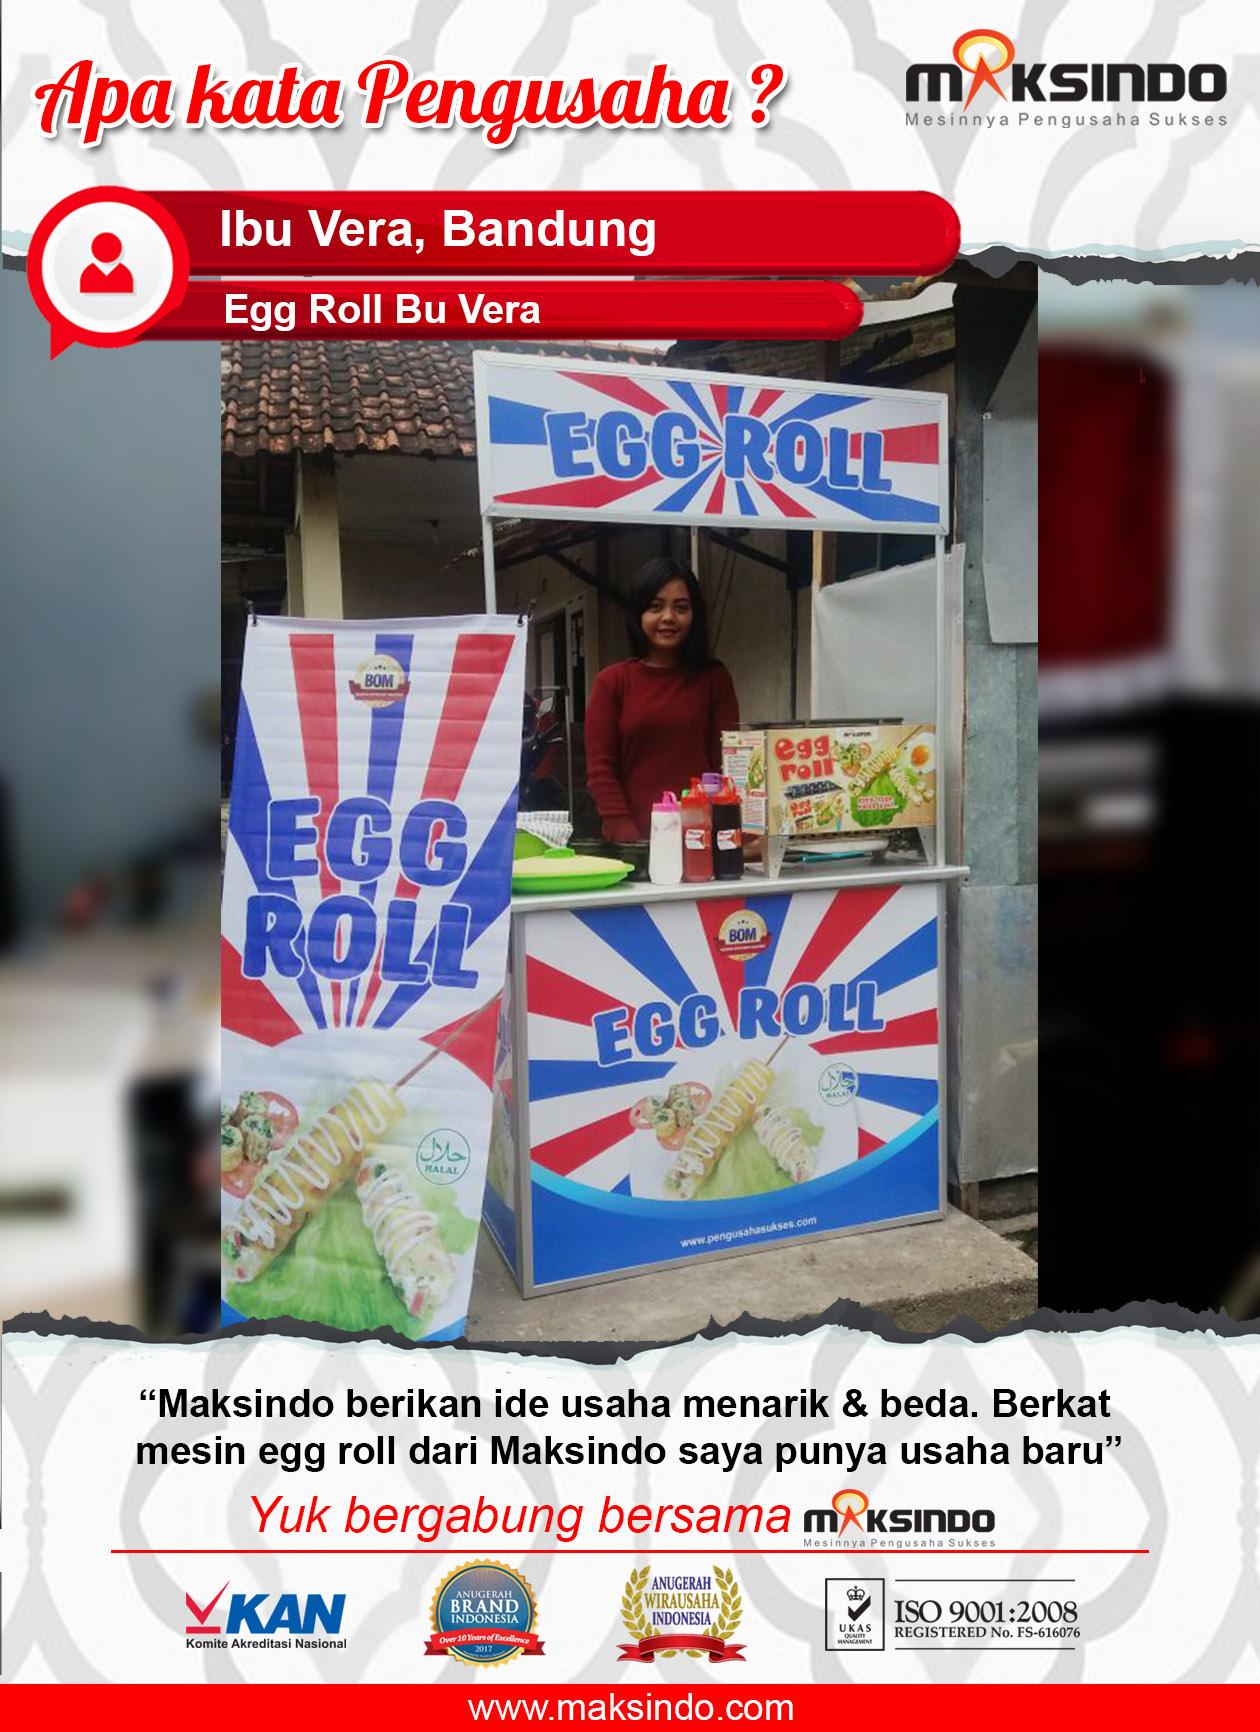 Egg Roll Bu Vera : Usaha Baru Berkat Ide Maksindo